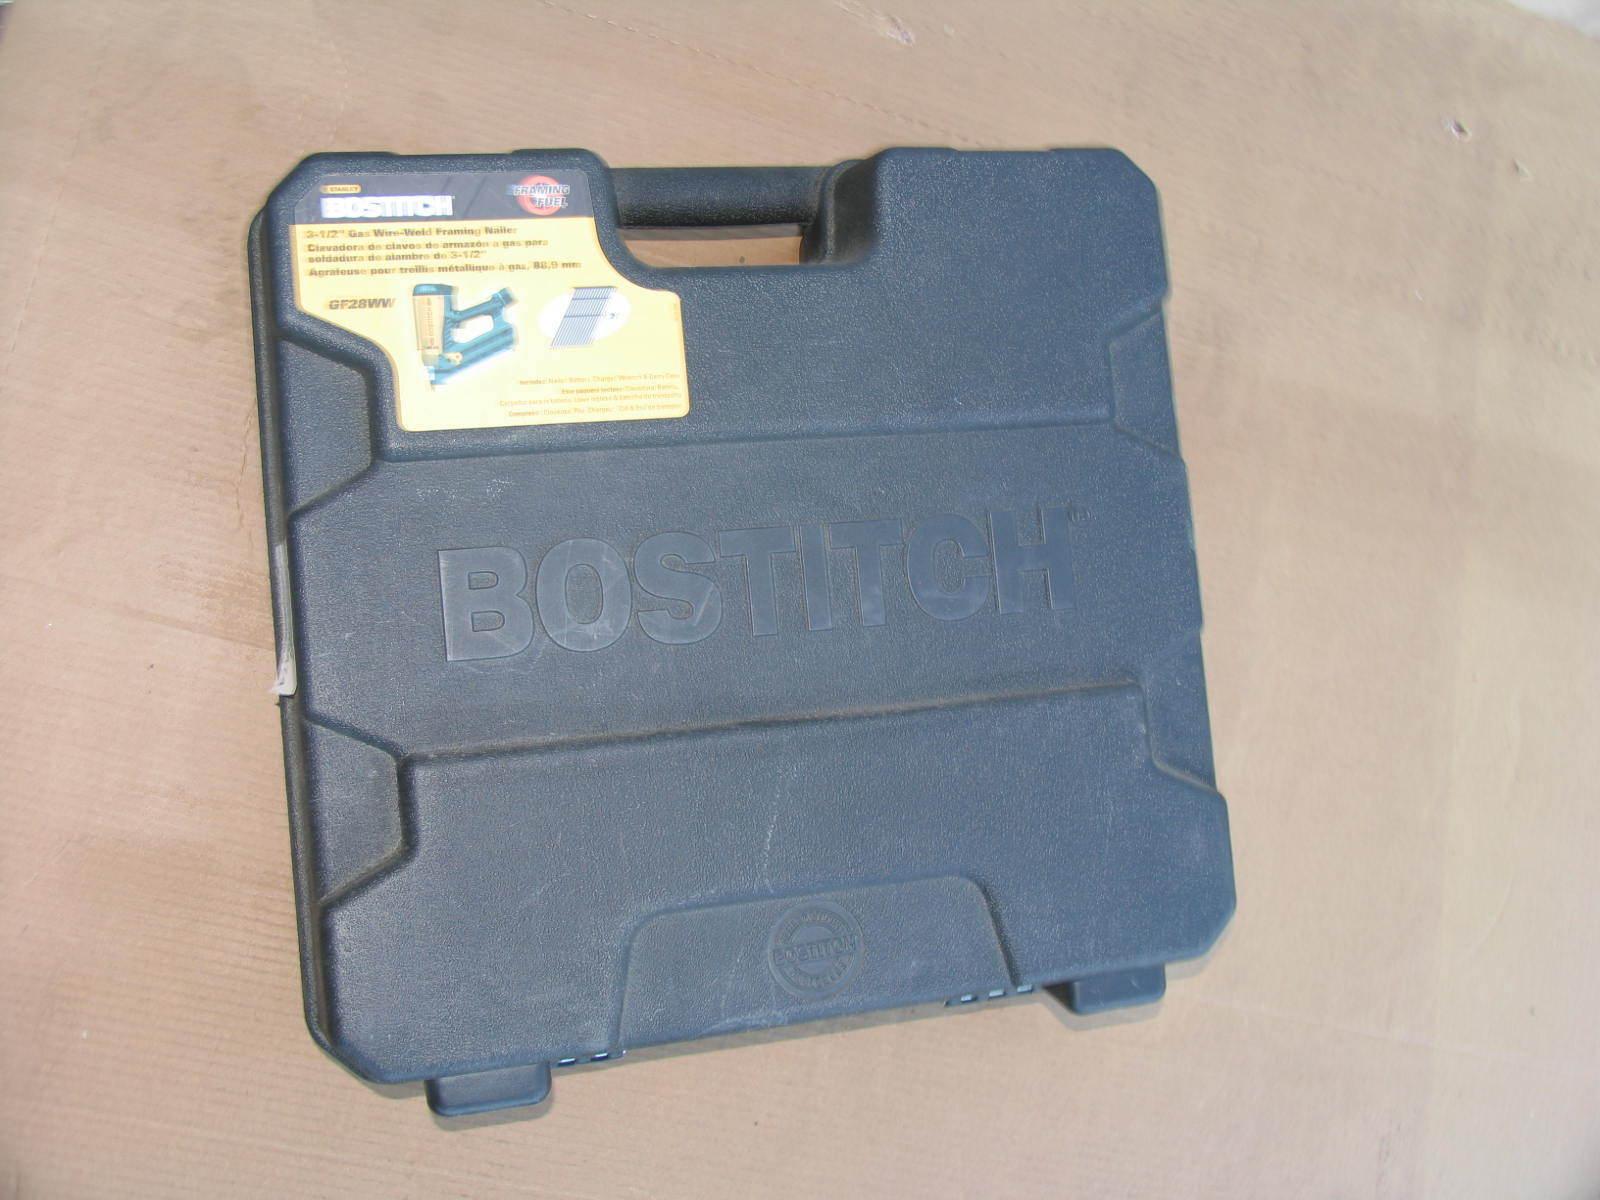 Stanley Bostitch GF28WW Cordless Wire Weld Framing Nailer W  case